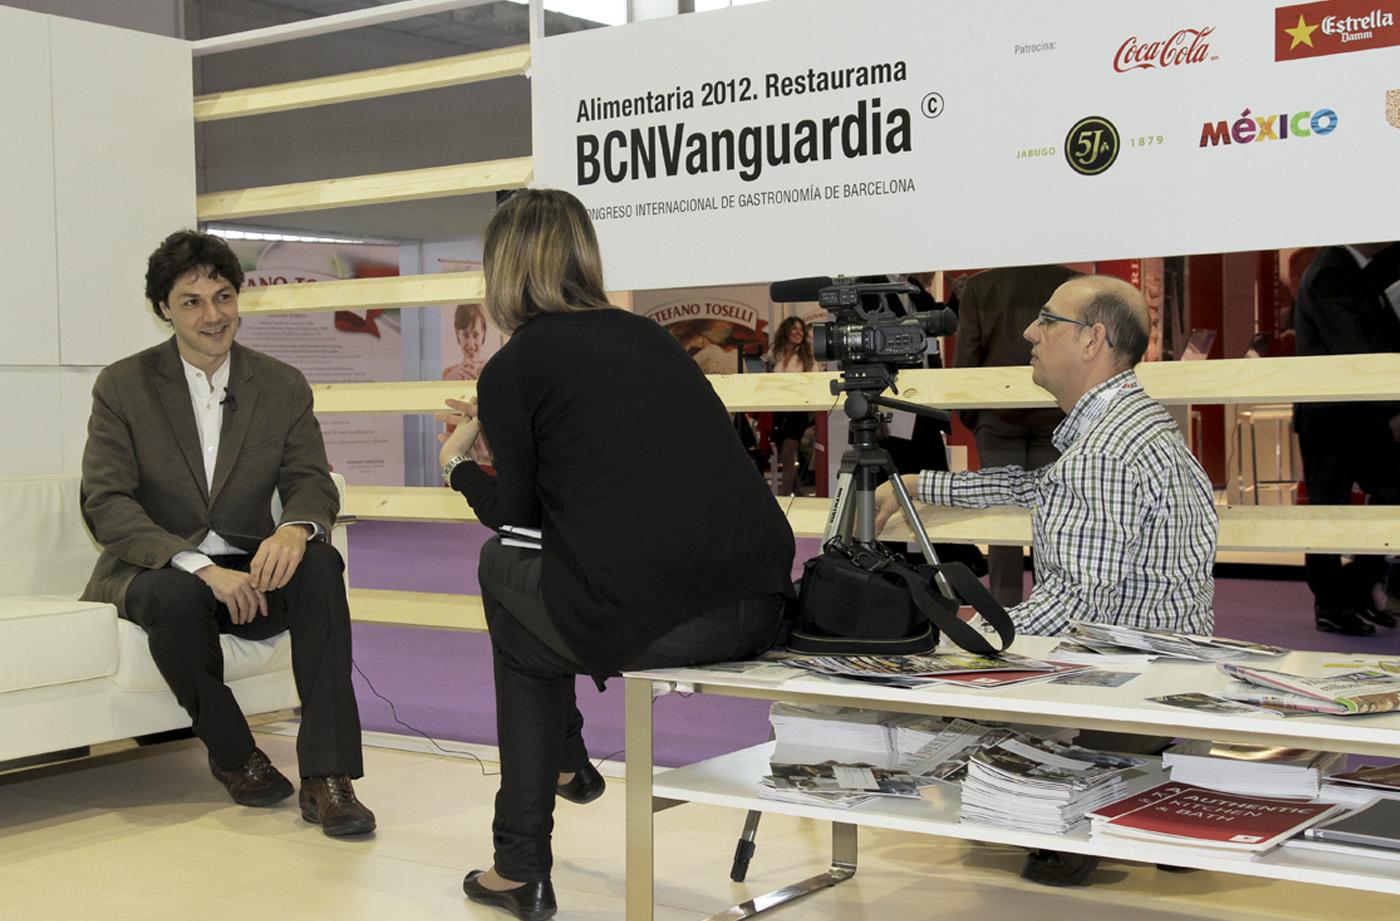 disseny-bcn-vanguardia-alimentaria-exhibitions-evento-creartiva